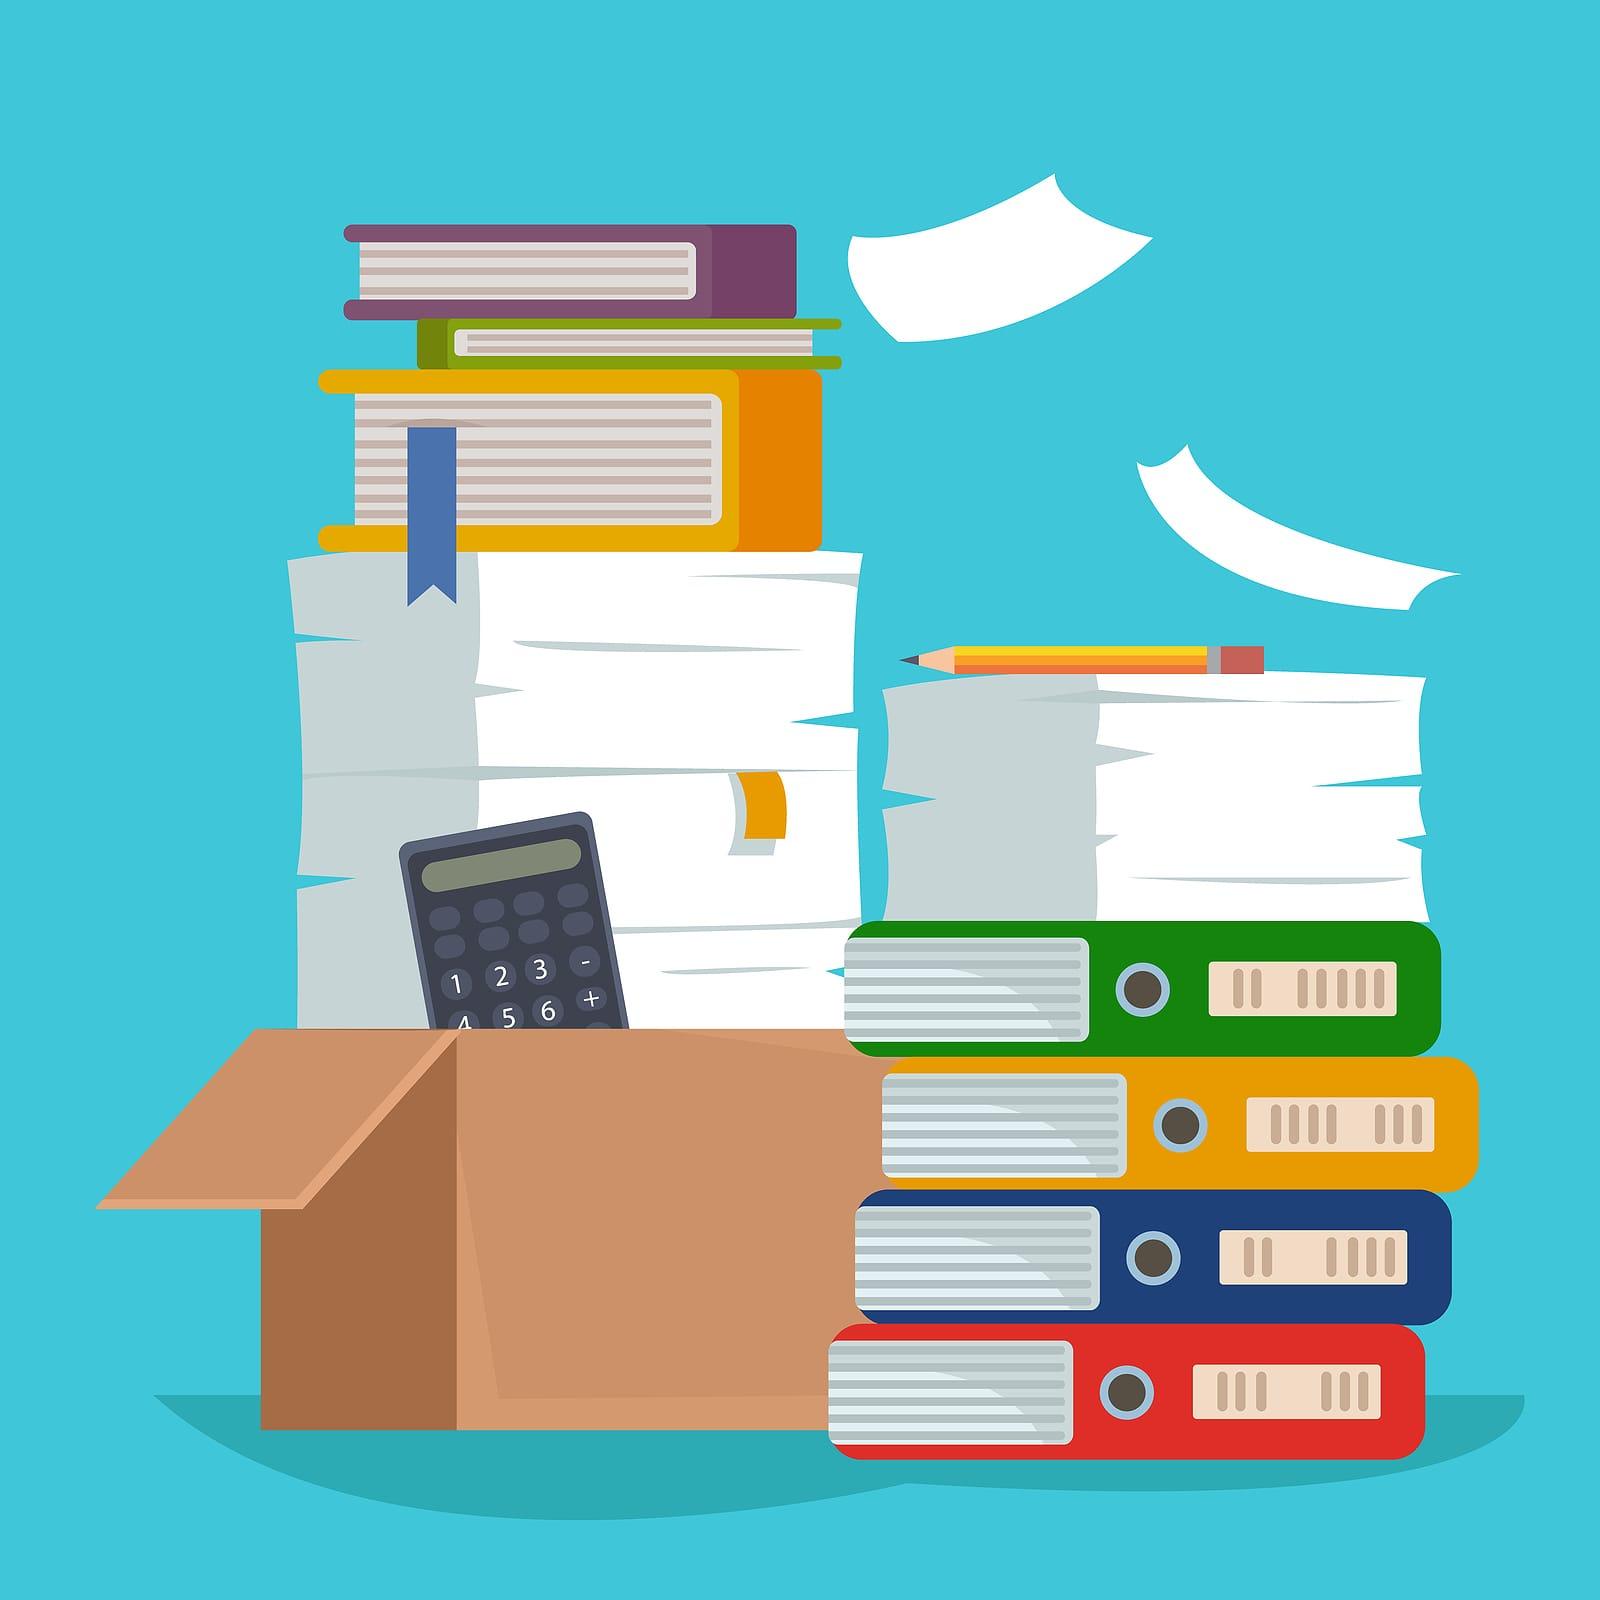 Document Storage Space